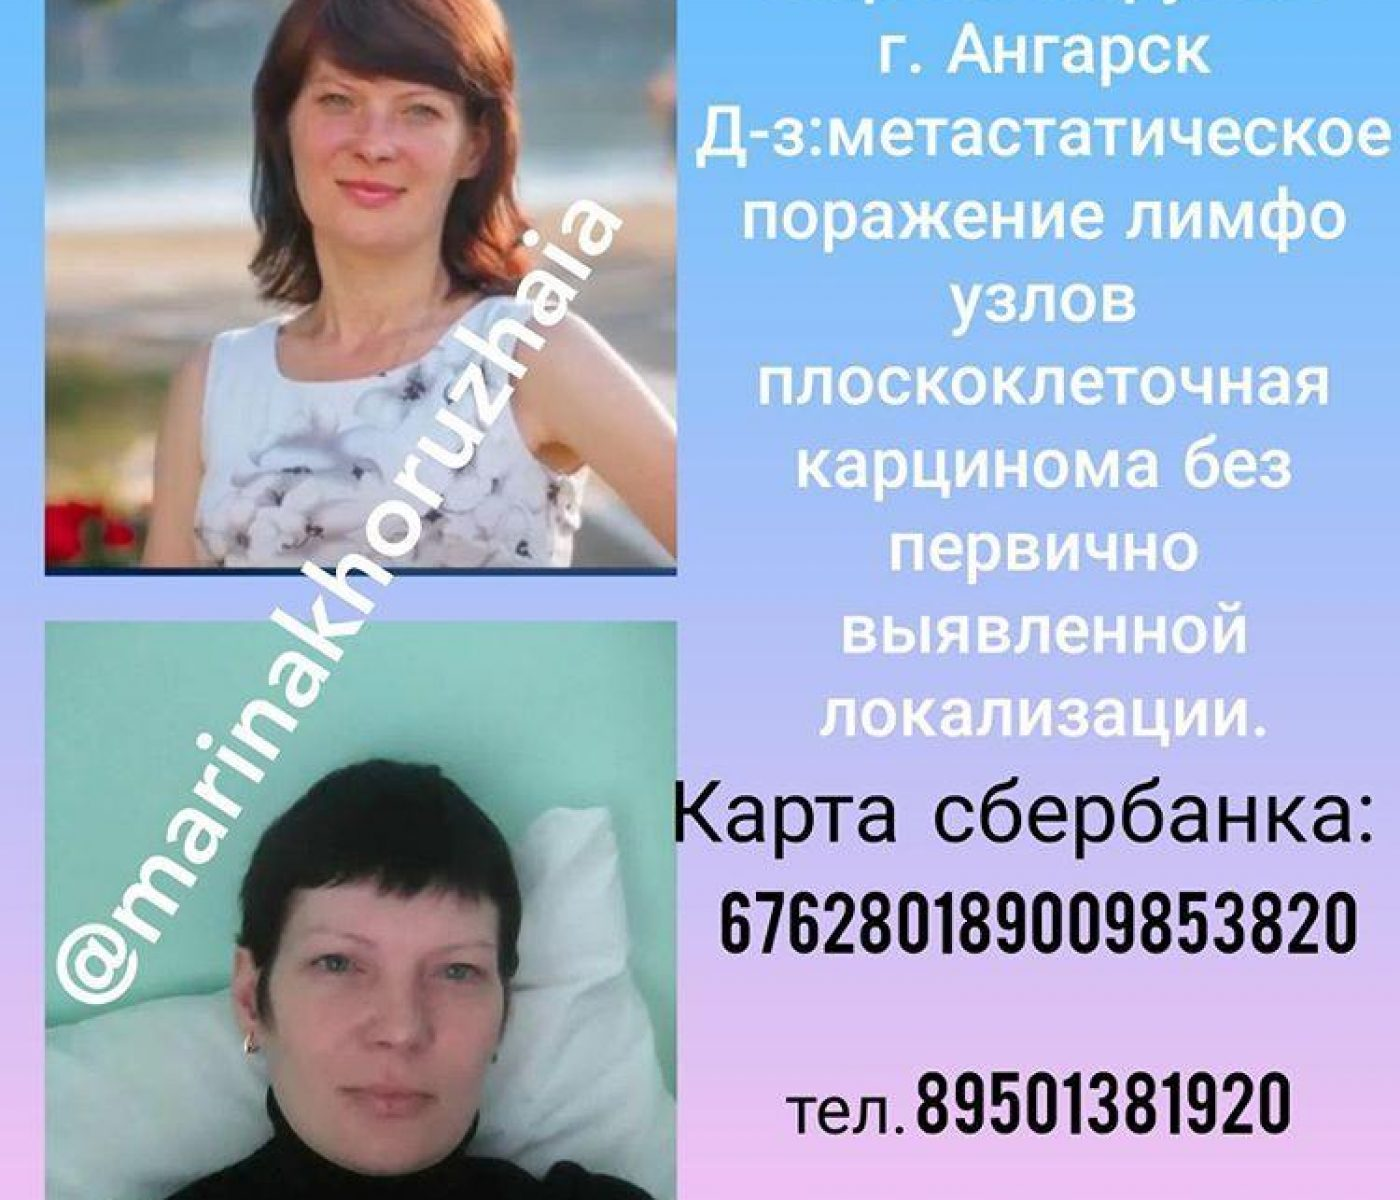 IMG_20200118_234322_089